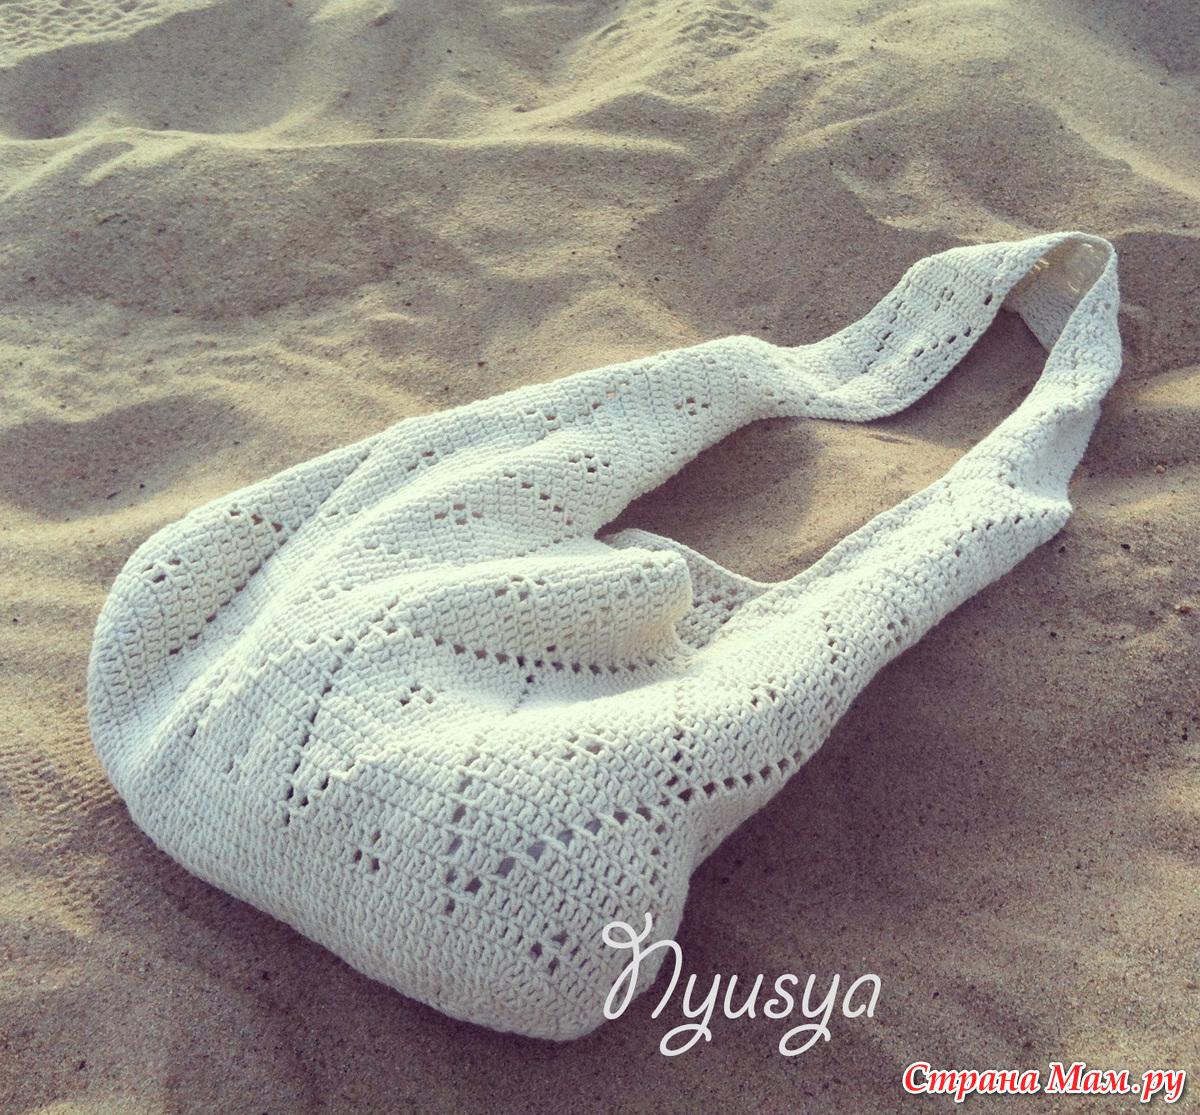 Вязаная крючком пляжная сумка своими руками 957